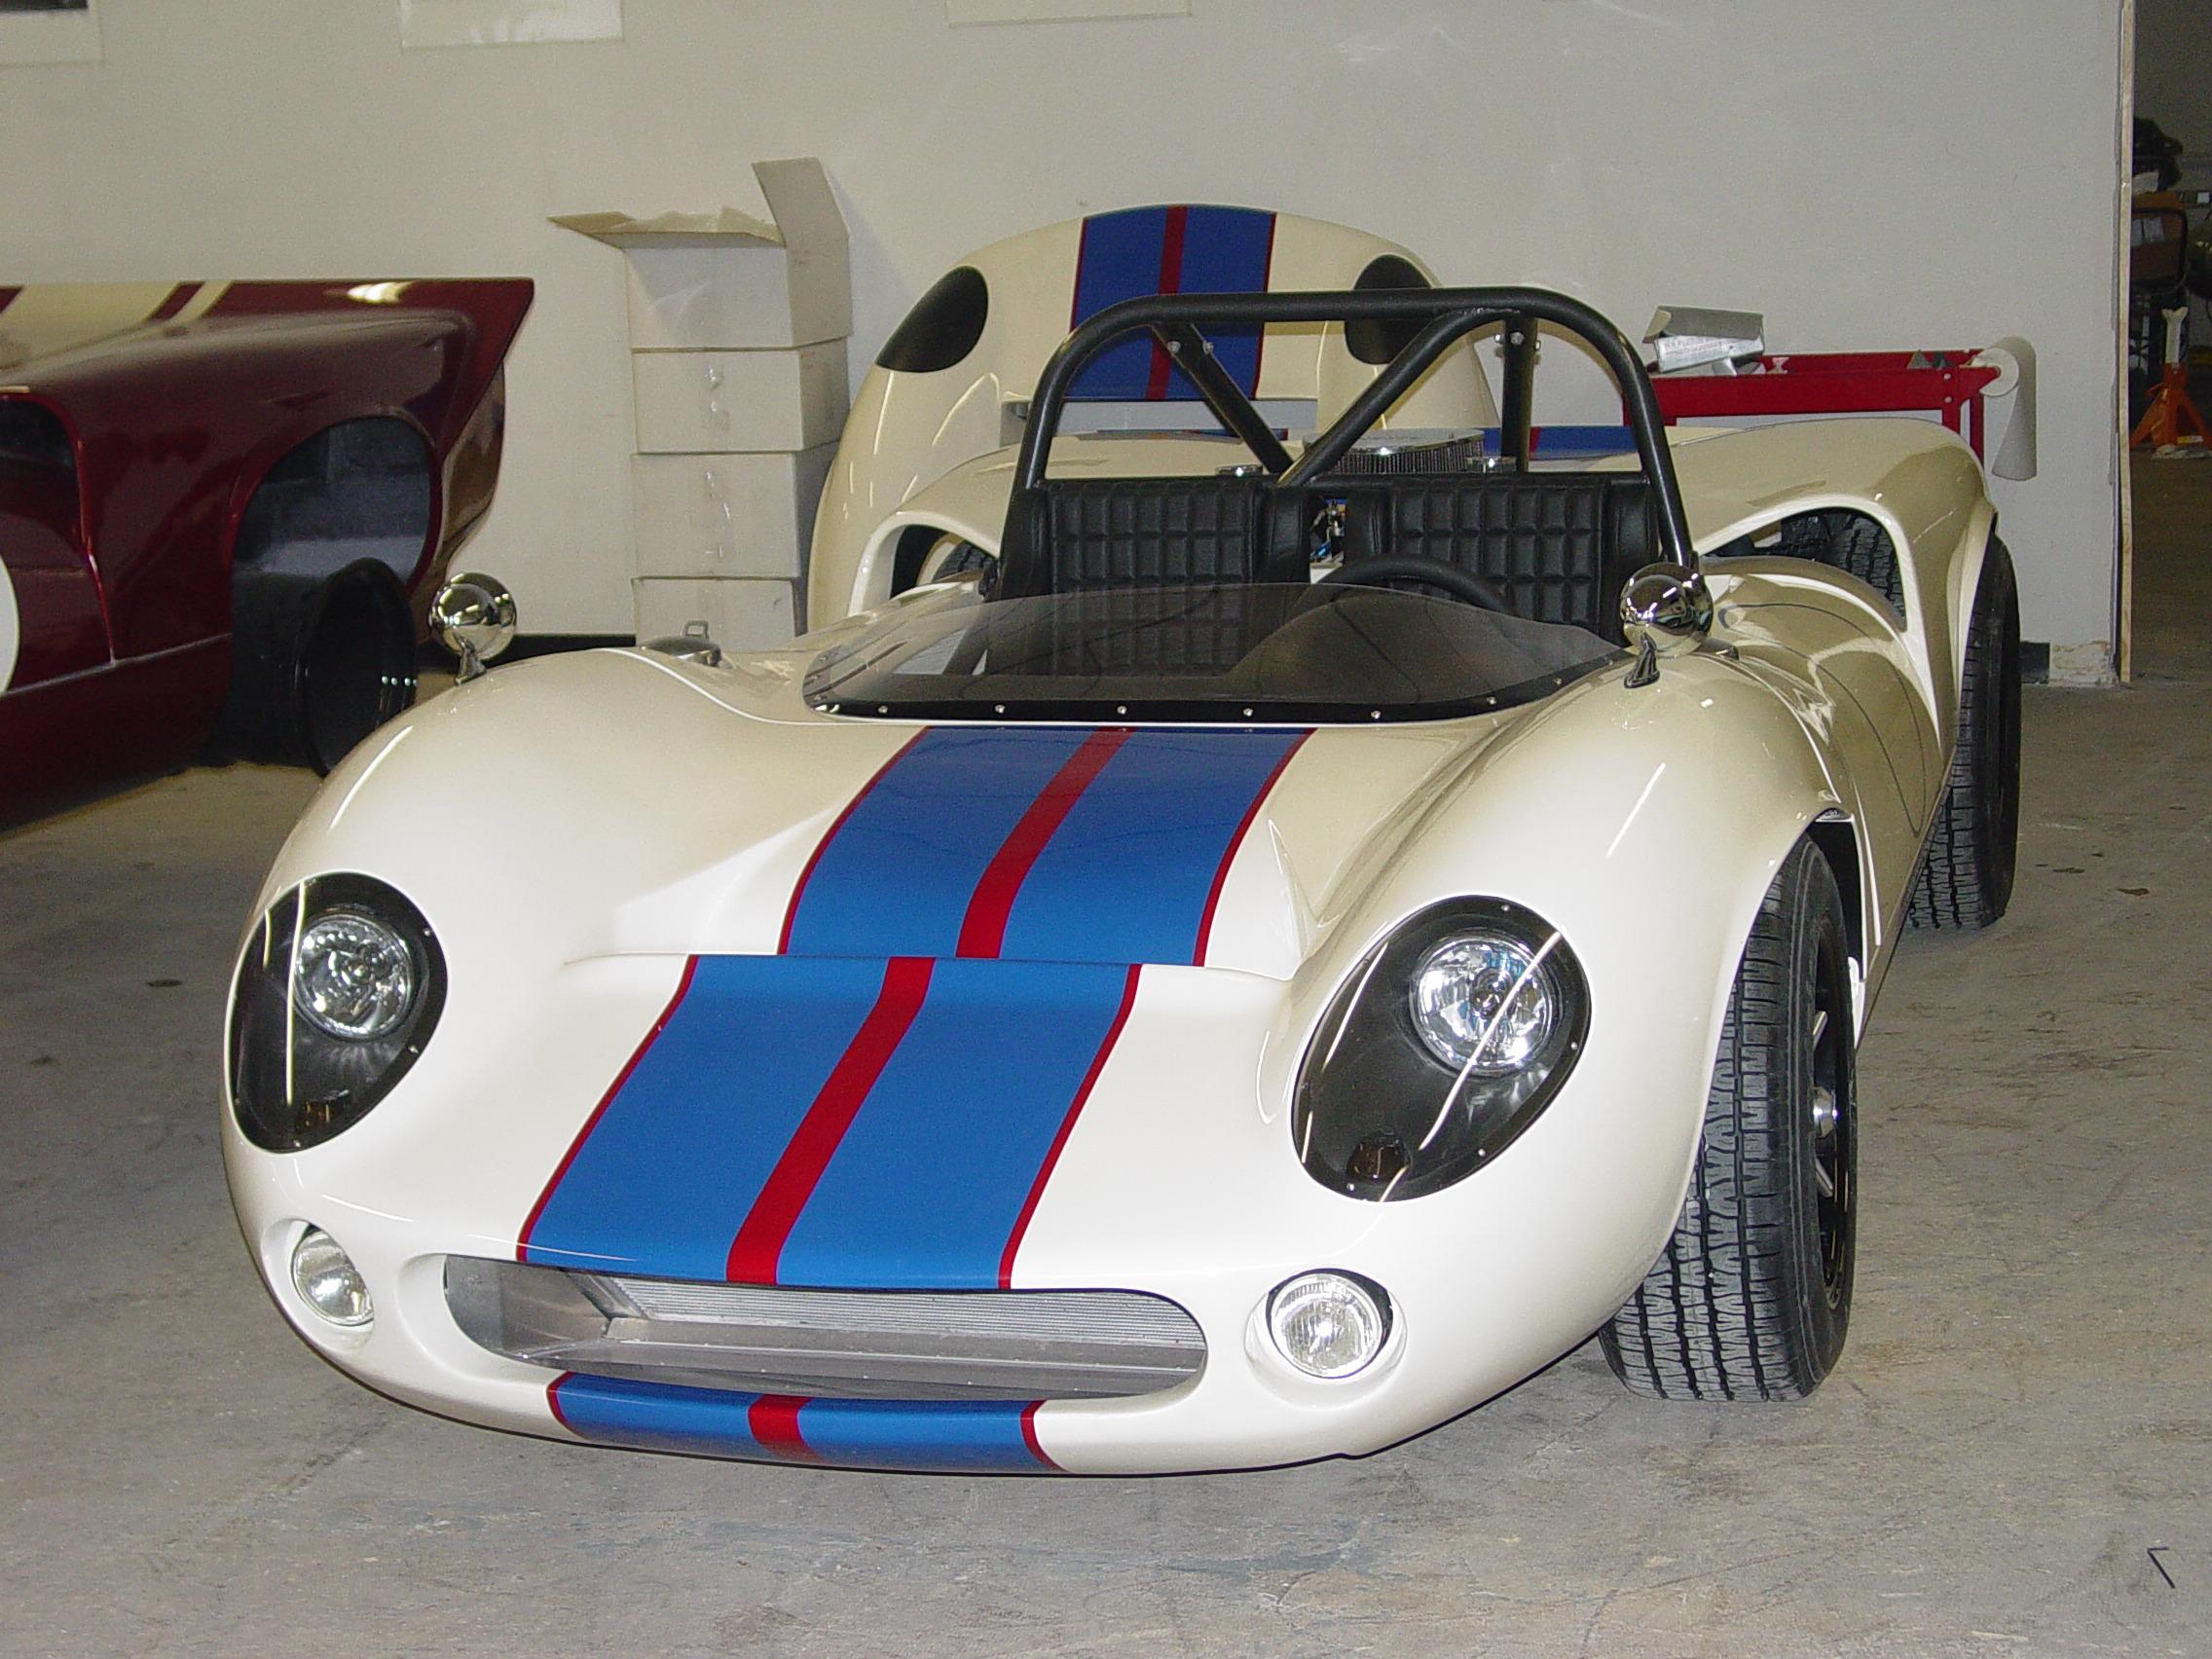 Eastons car 009.jpg